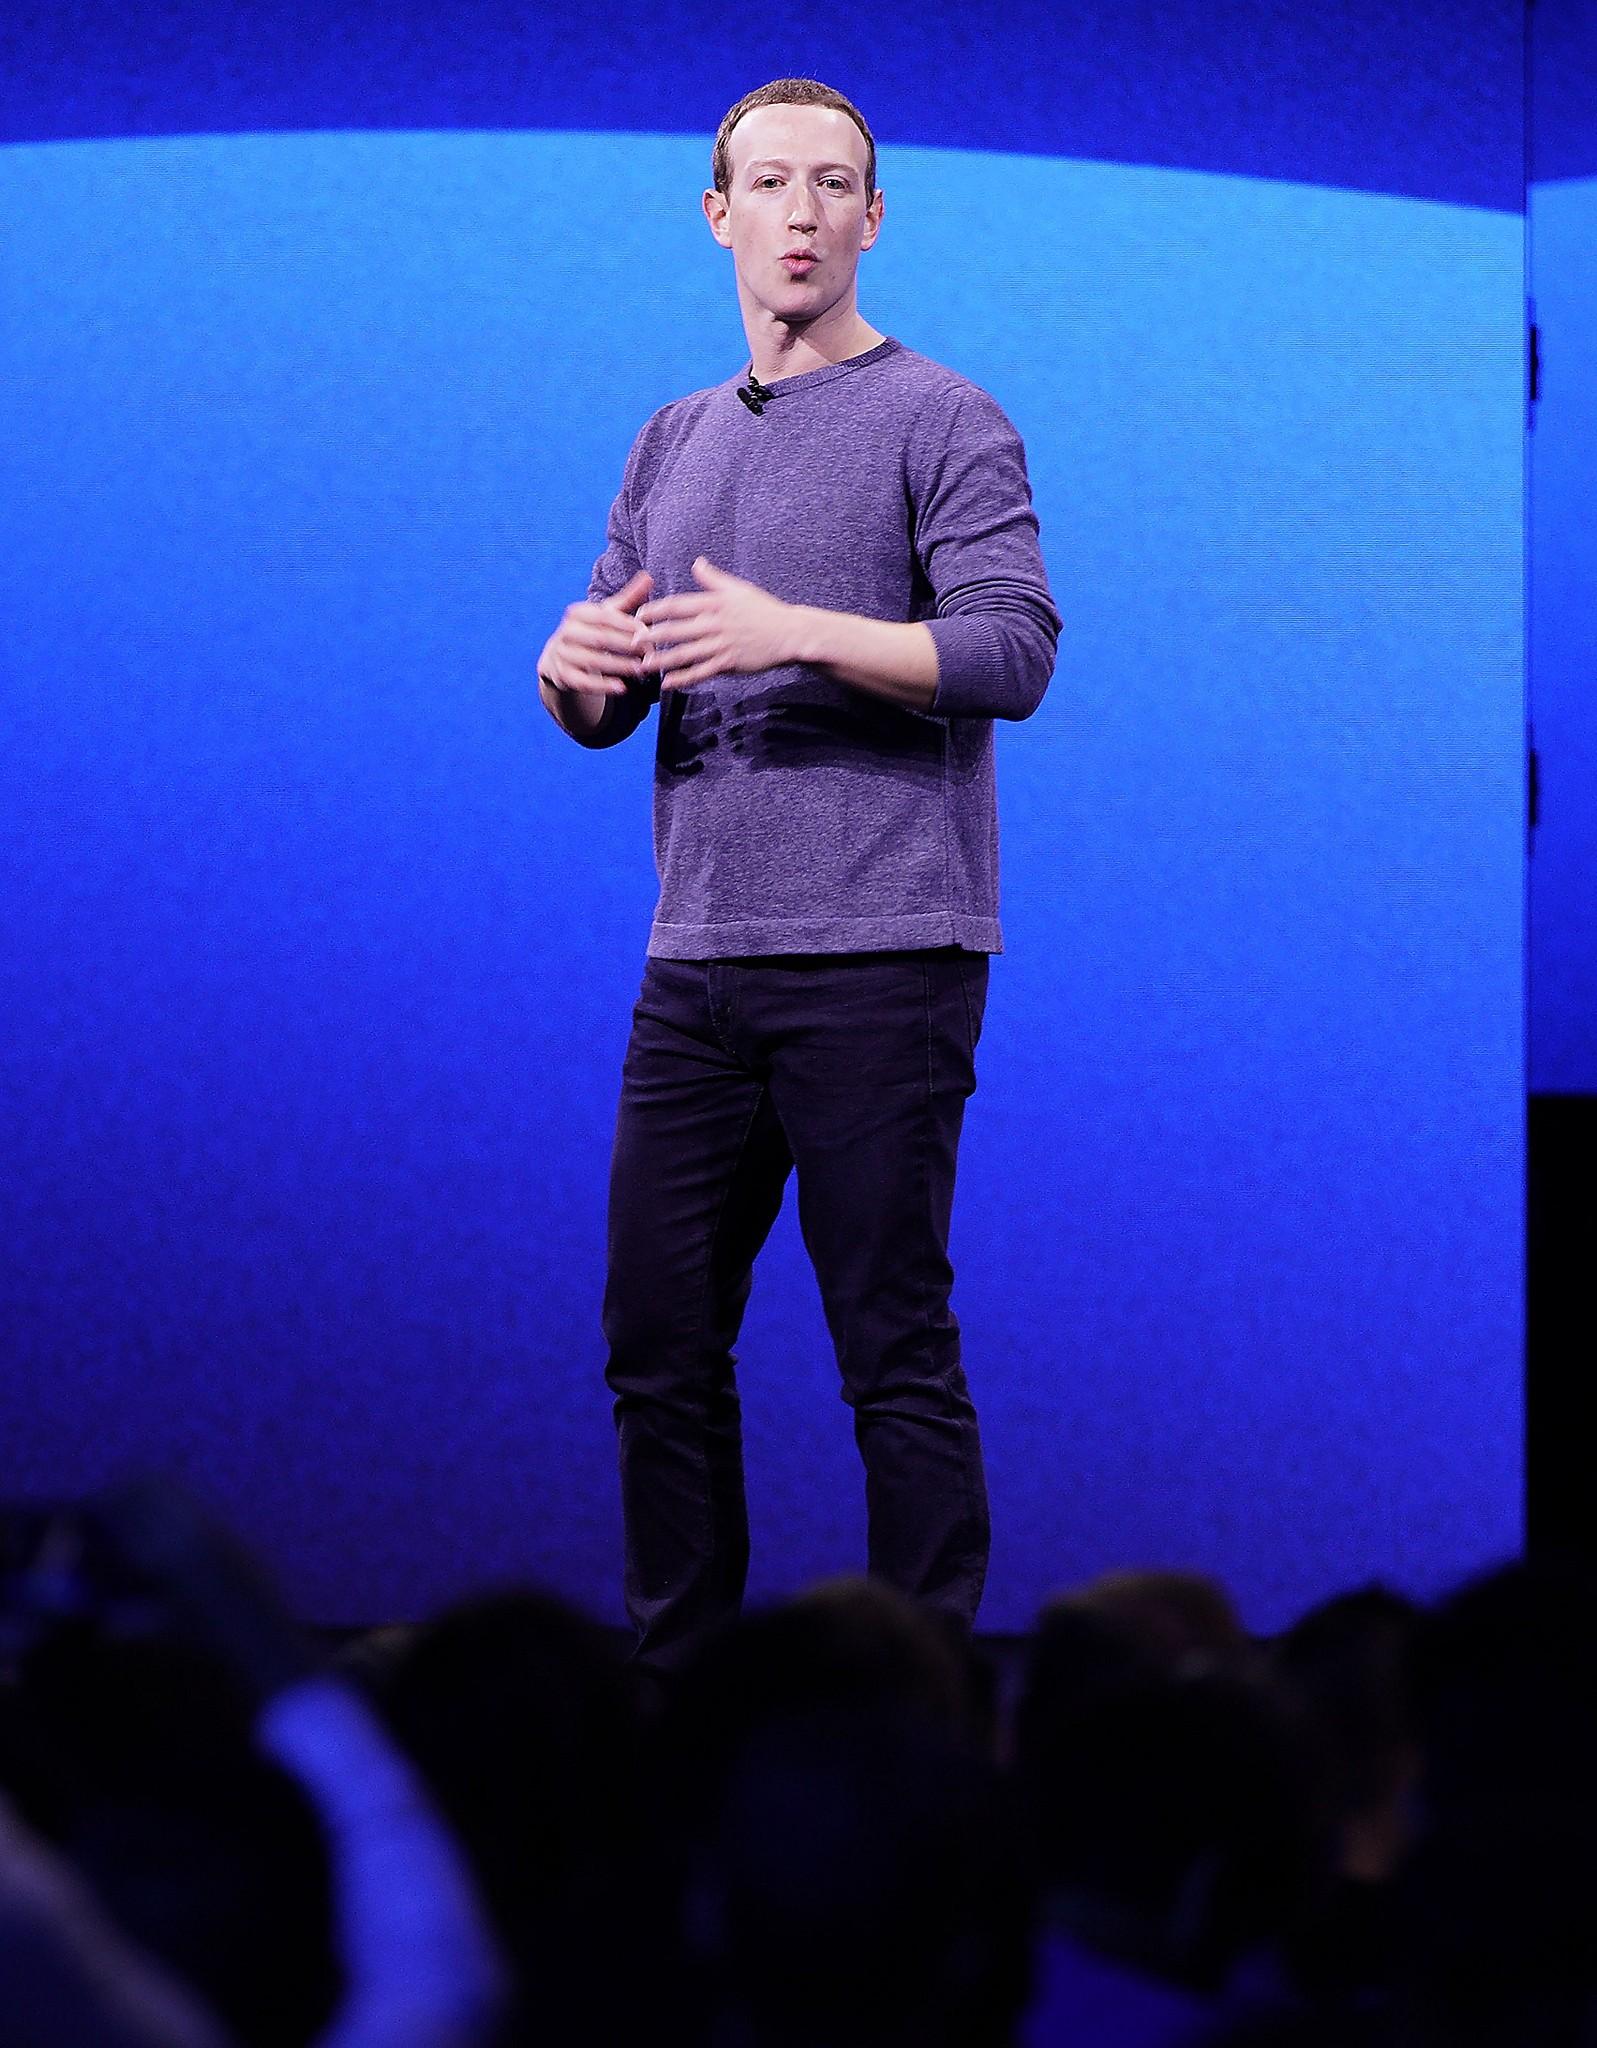 Facebook Tools Are Unwittingly Auto-Generating Terror Content